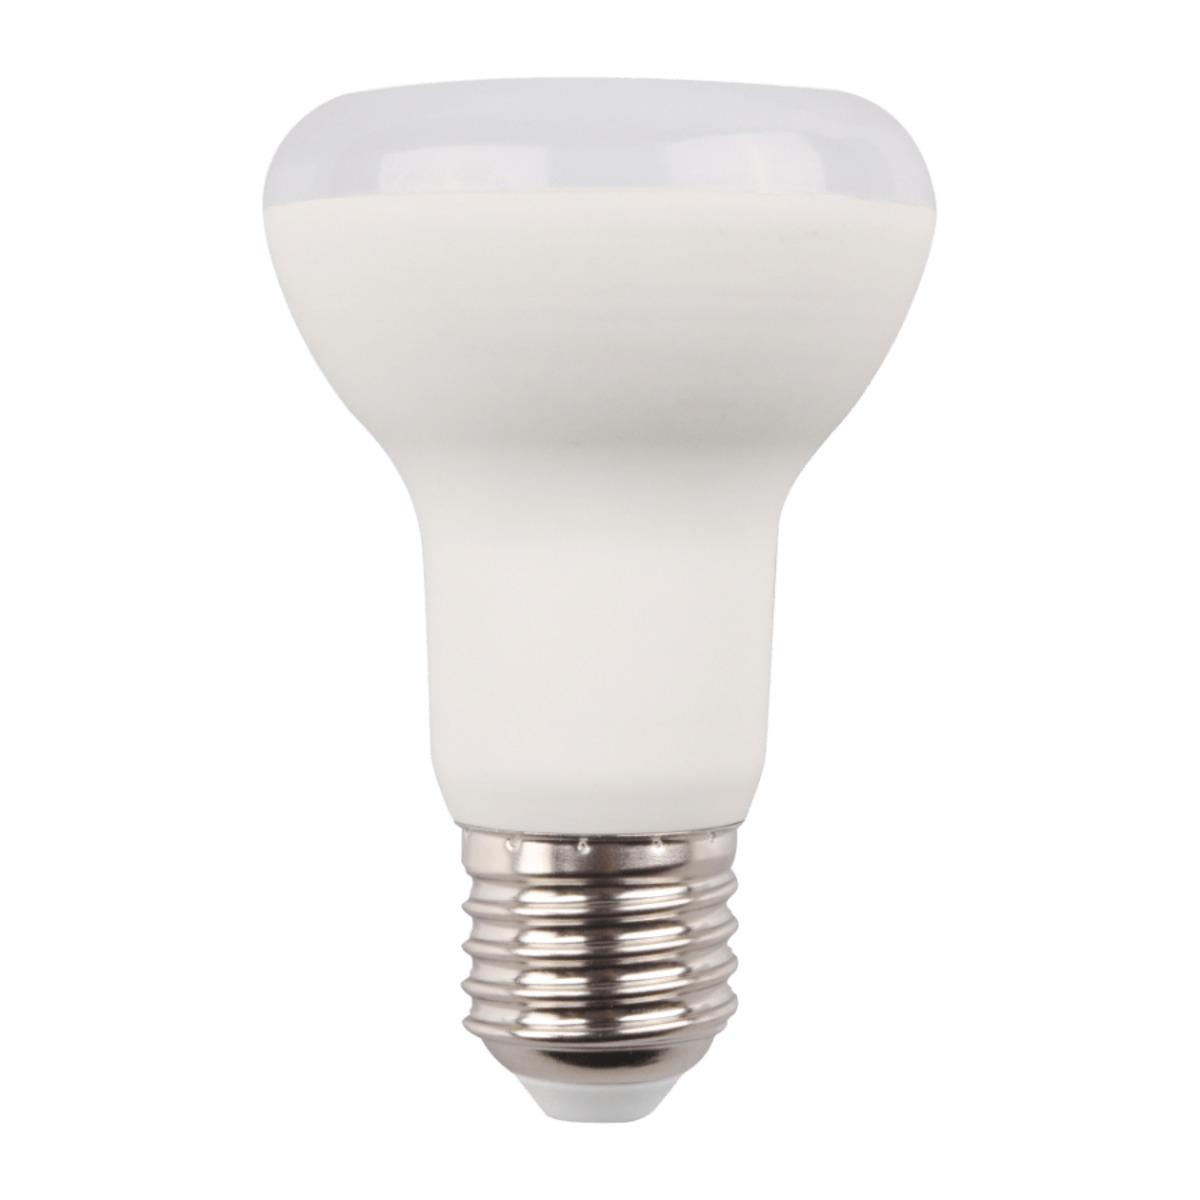 Bild 4 von LIGHTZONE     LED-Reflektor